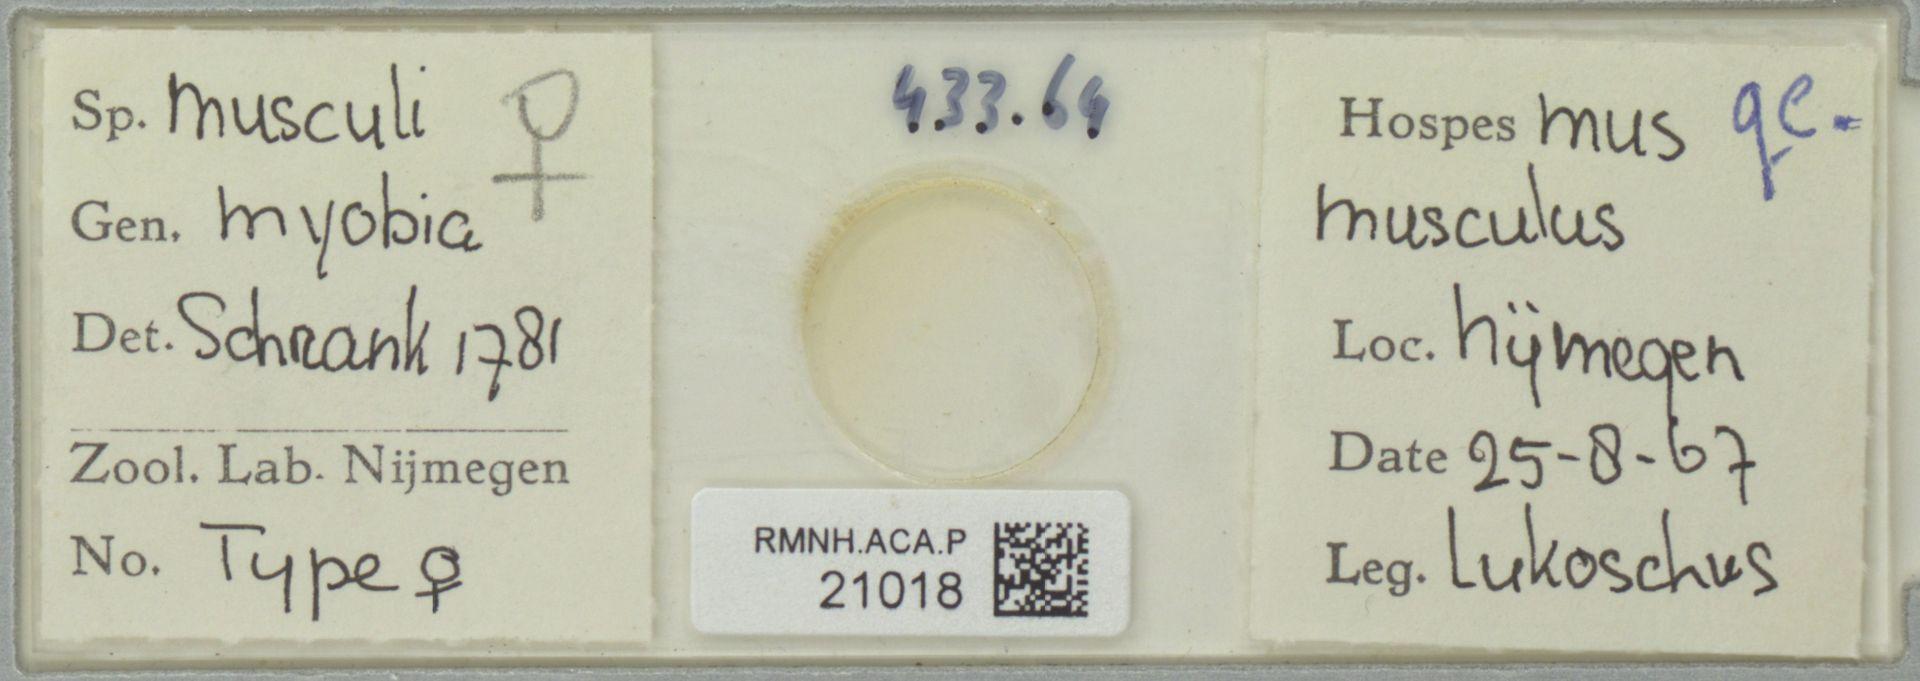 RMNH.ACA.P.21018 | Myobia musculi